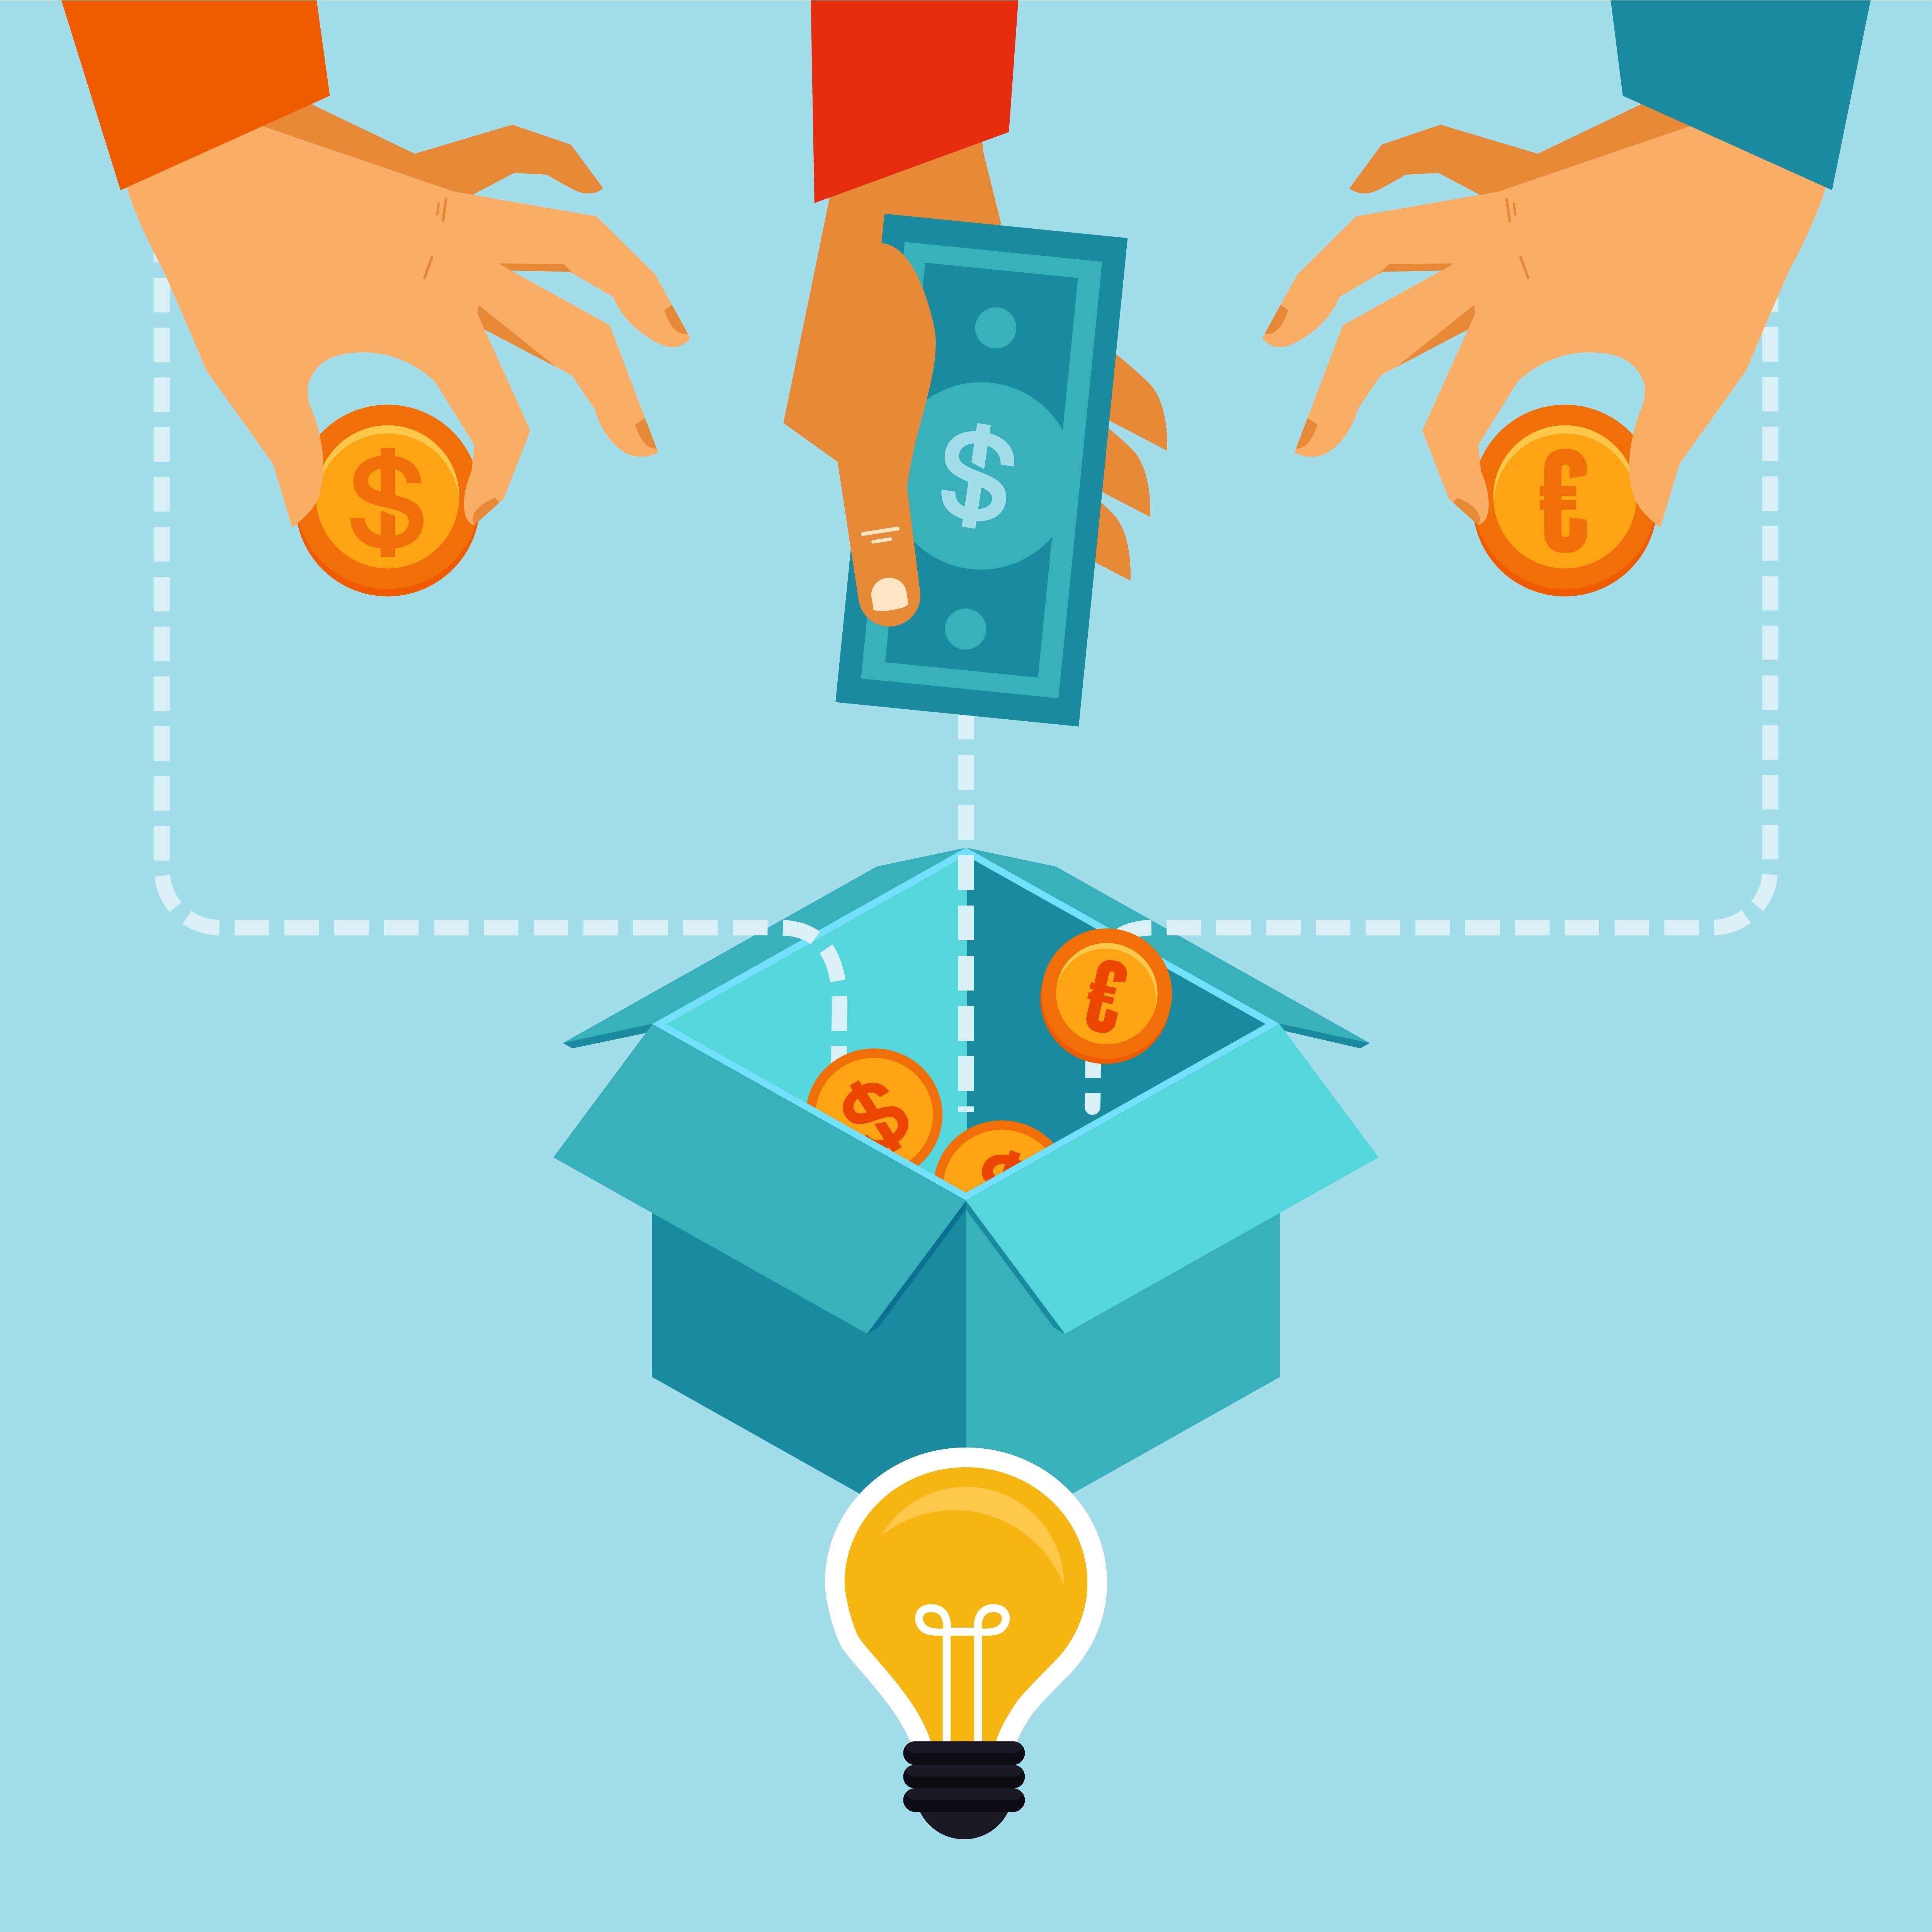 consulta legal plataforma de crowdfunding